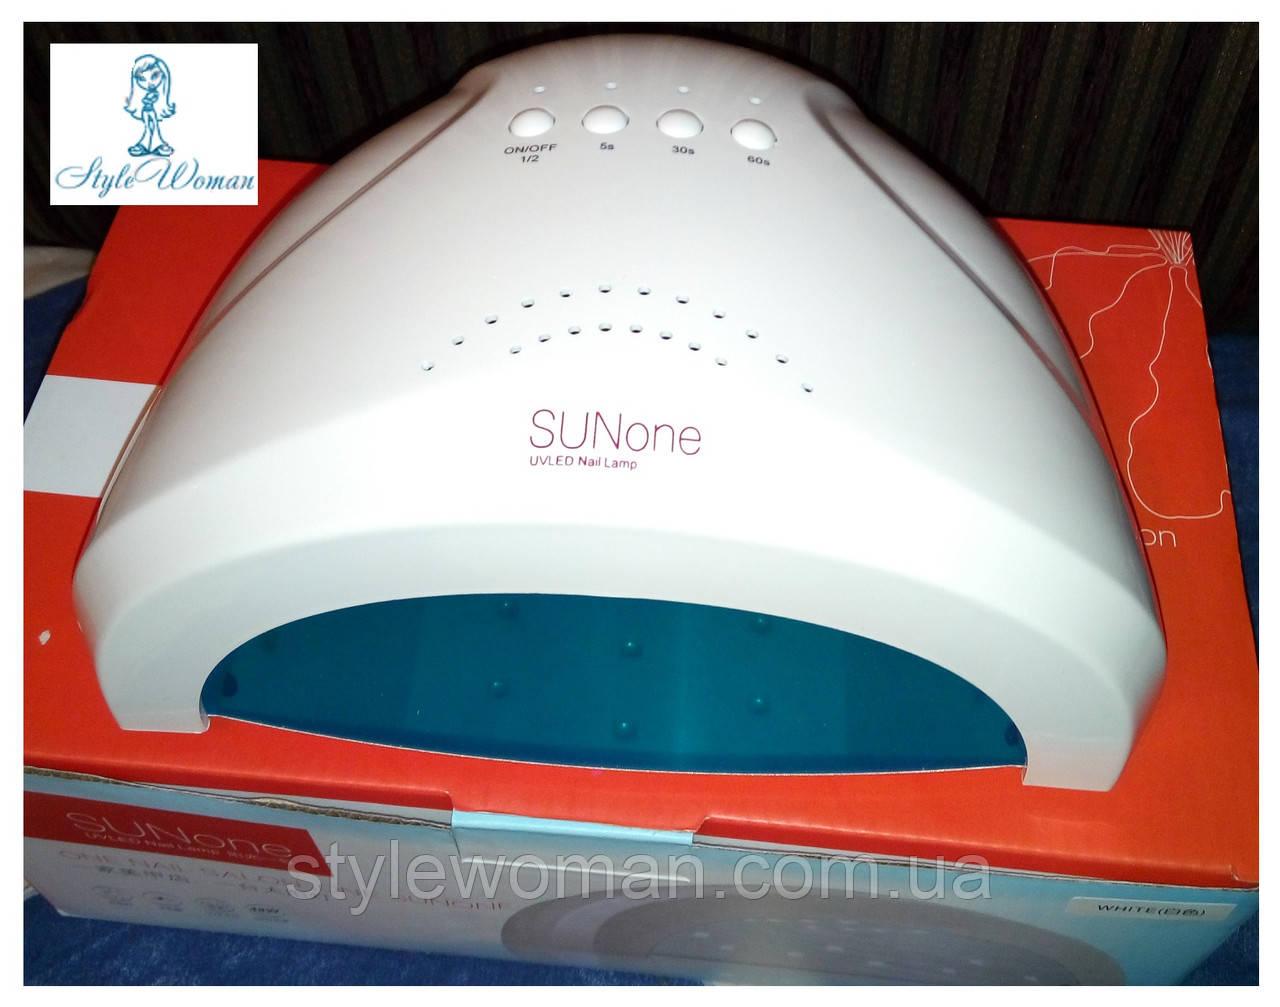 UV-LED Лампа SUN One 48W профессиональная лампа для сушки ногтей